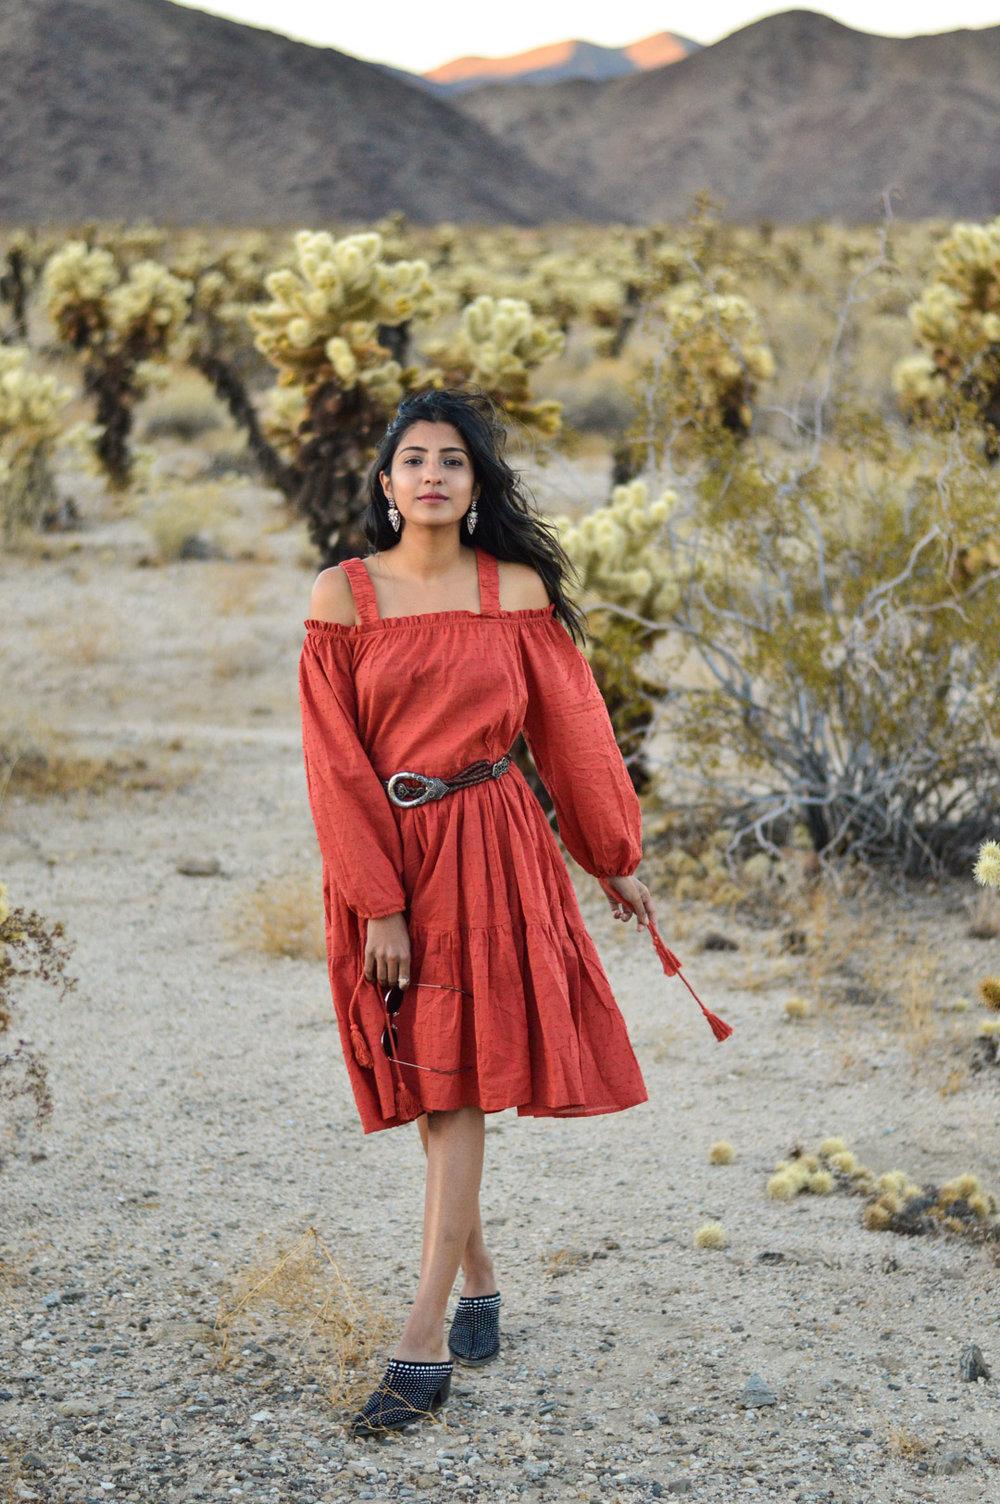 cholla-cactus-garden-joshua-tree-travel-itinerary-fashion-blogger-boho-style 8